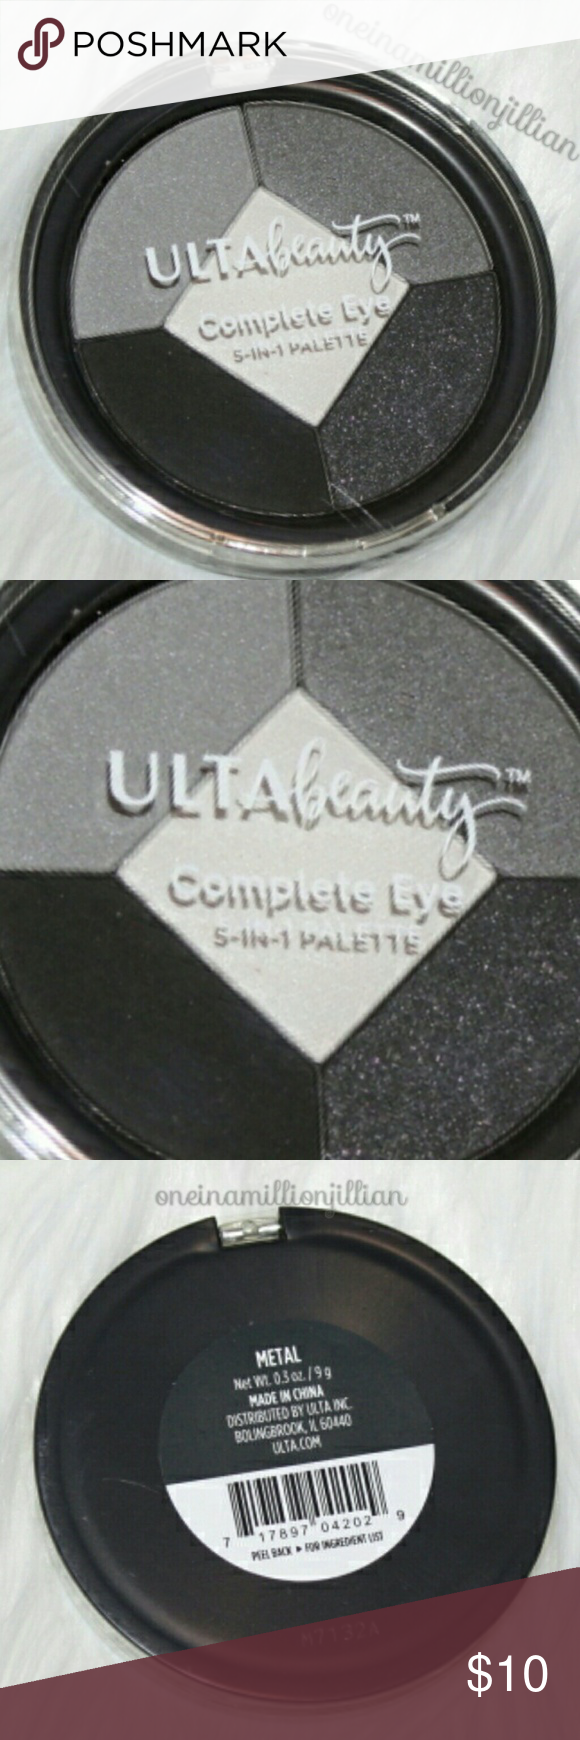 Ulta Complete Eye Shadow & Liner Palette Boutique